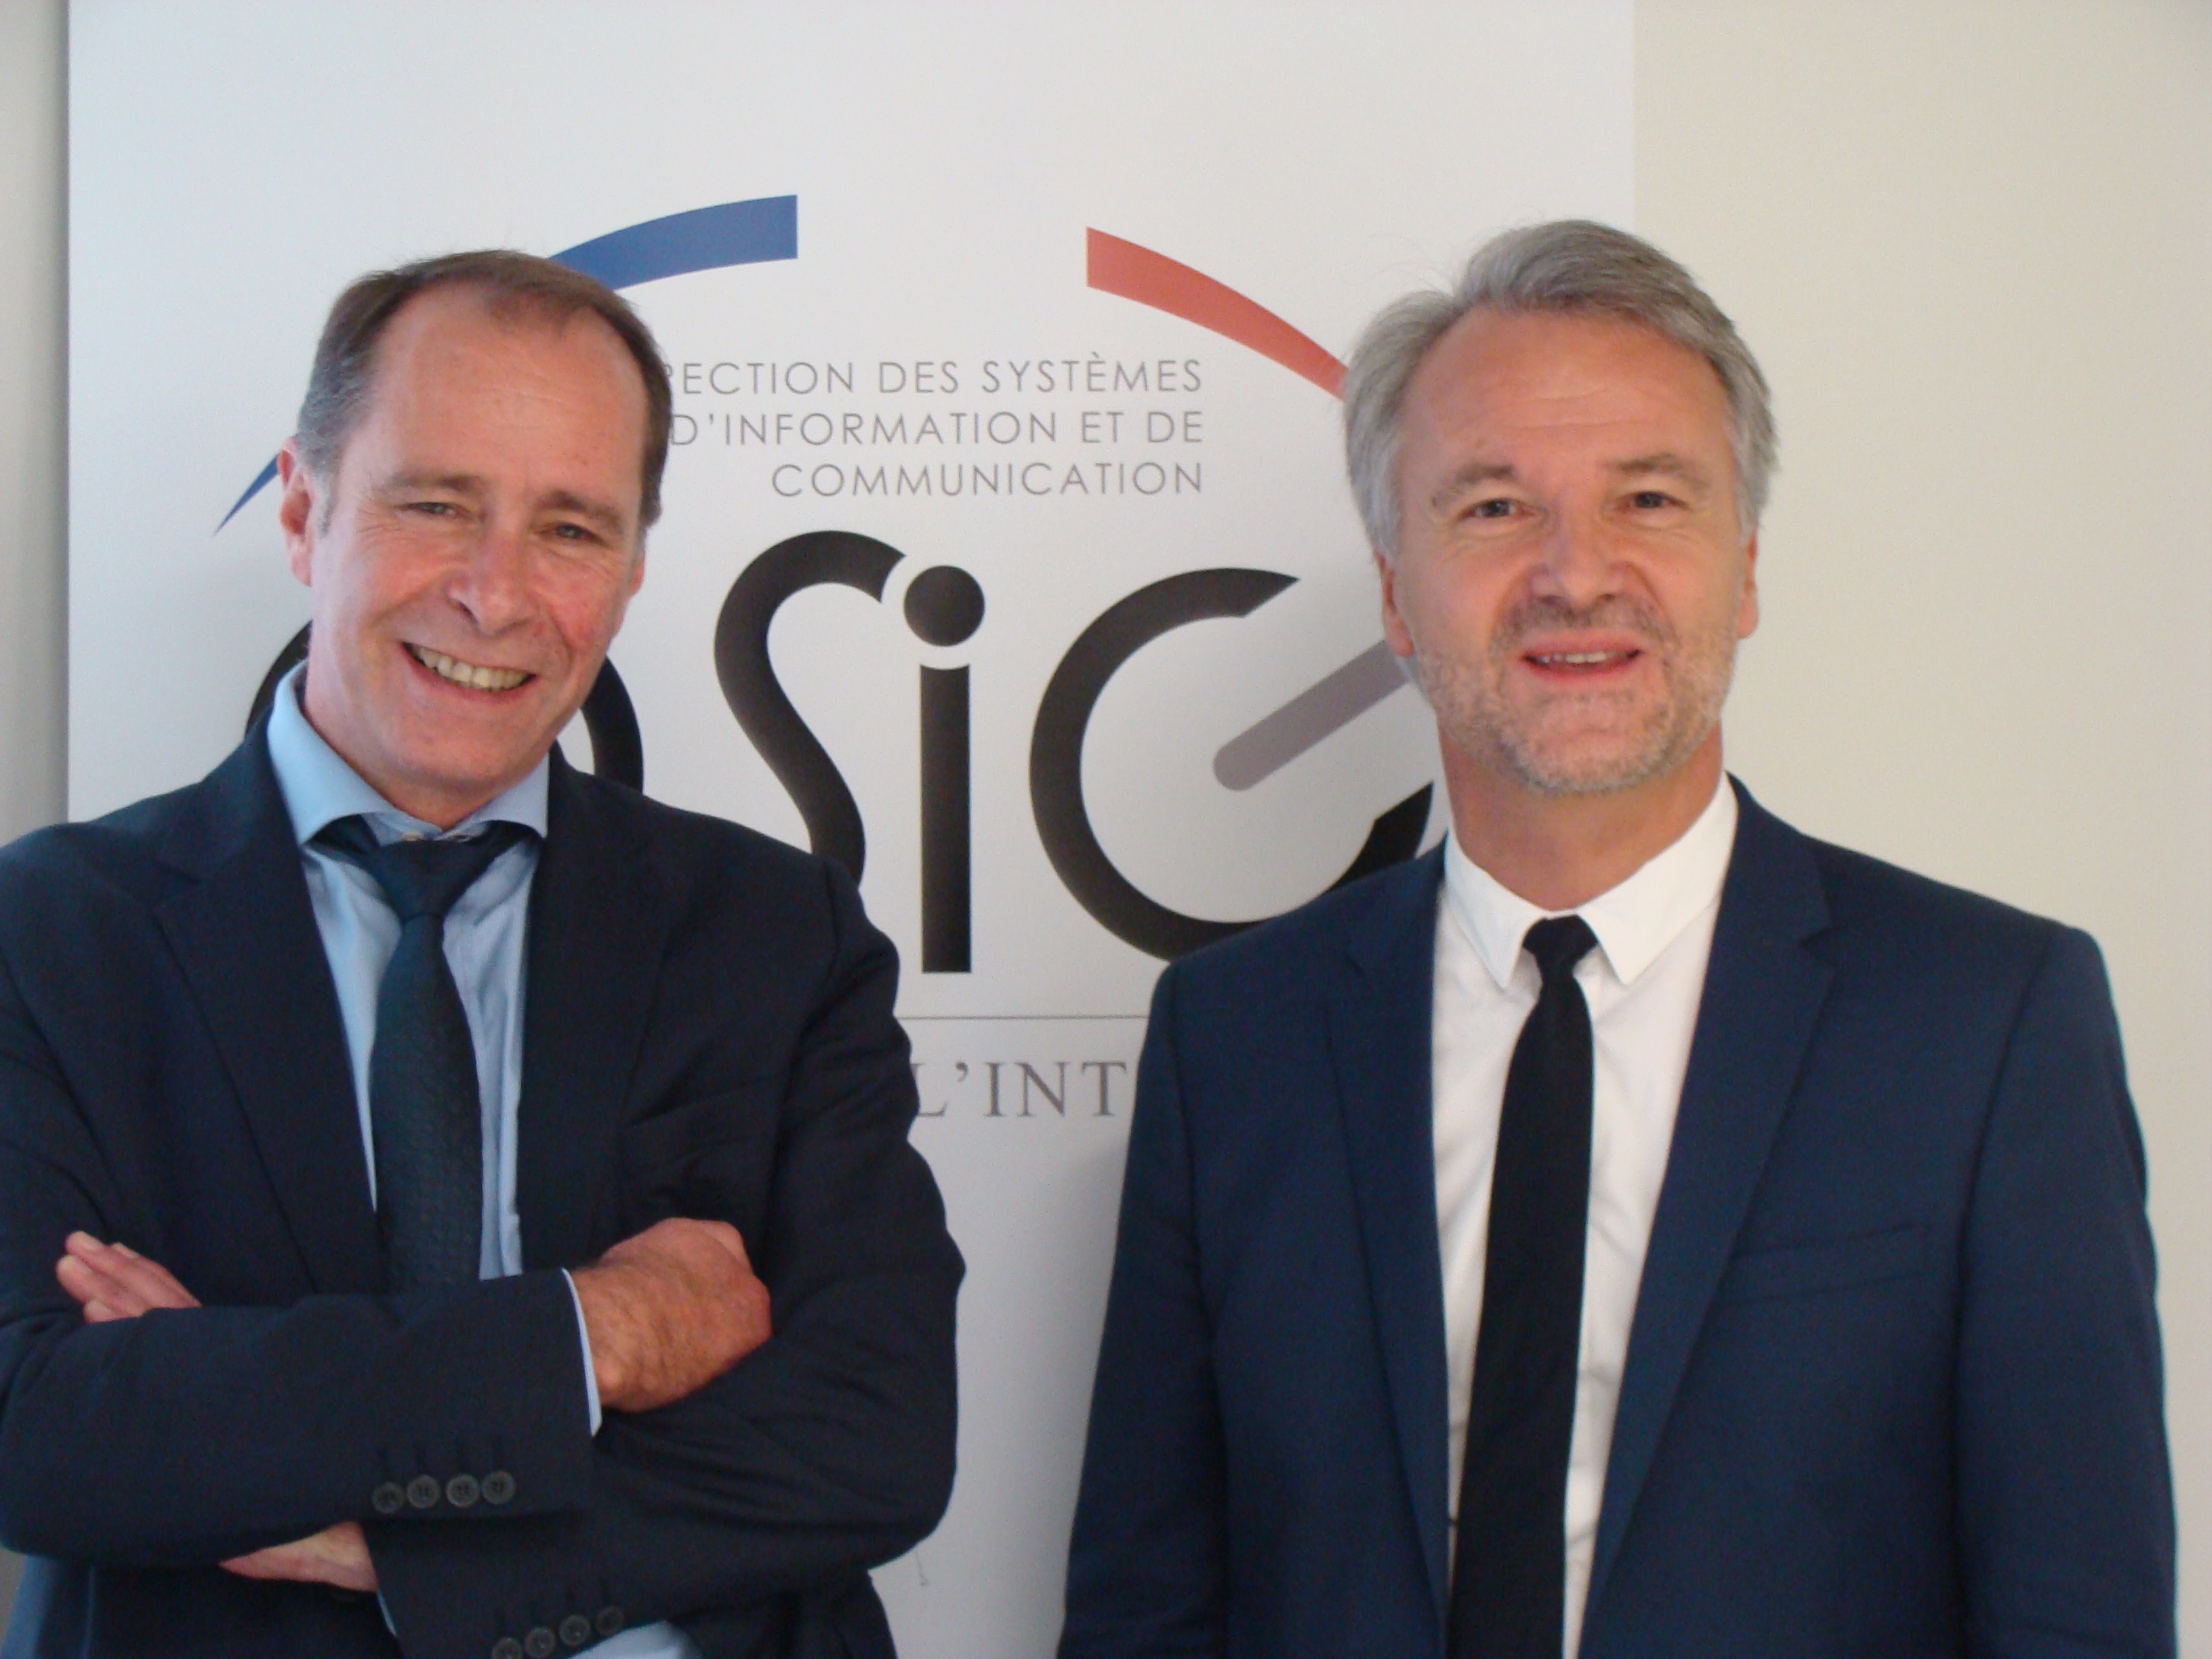 Xavier Poisson et Nicolas Duffour